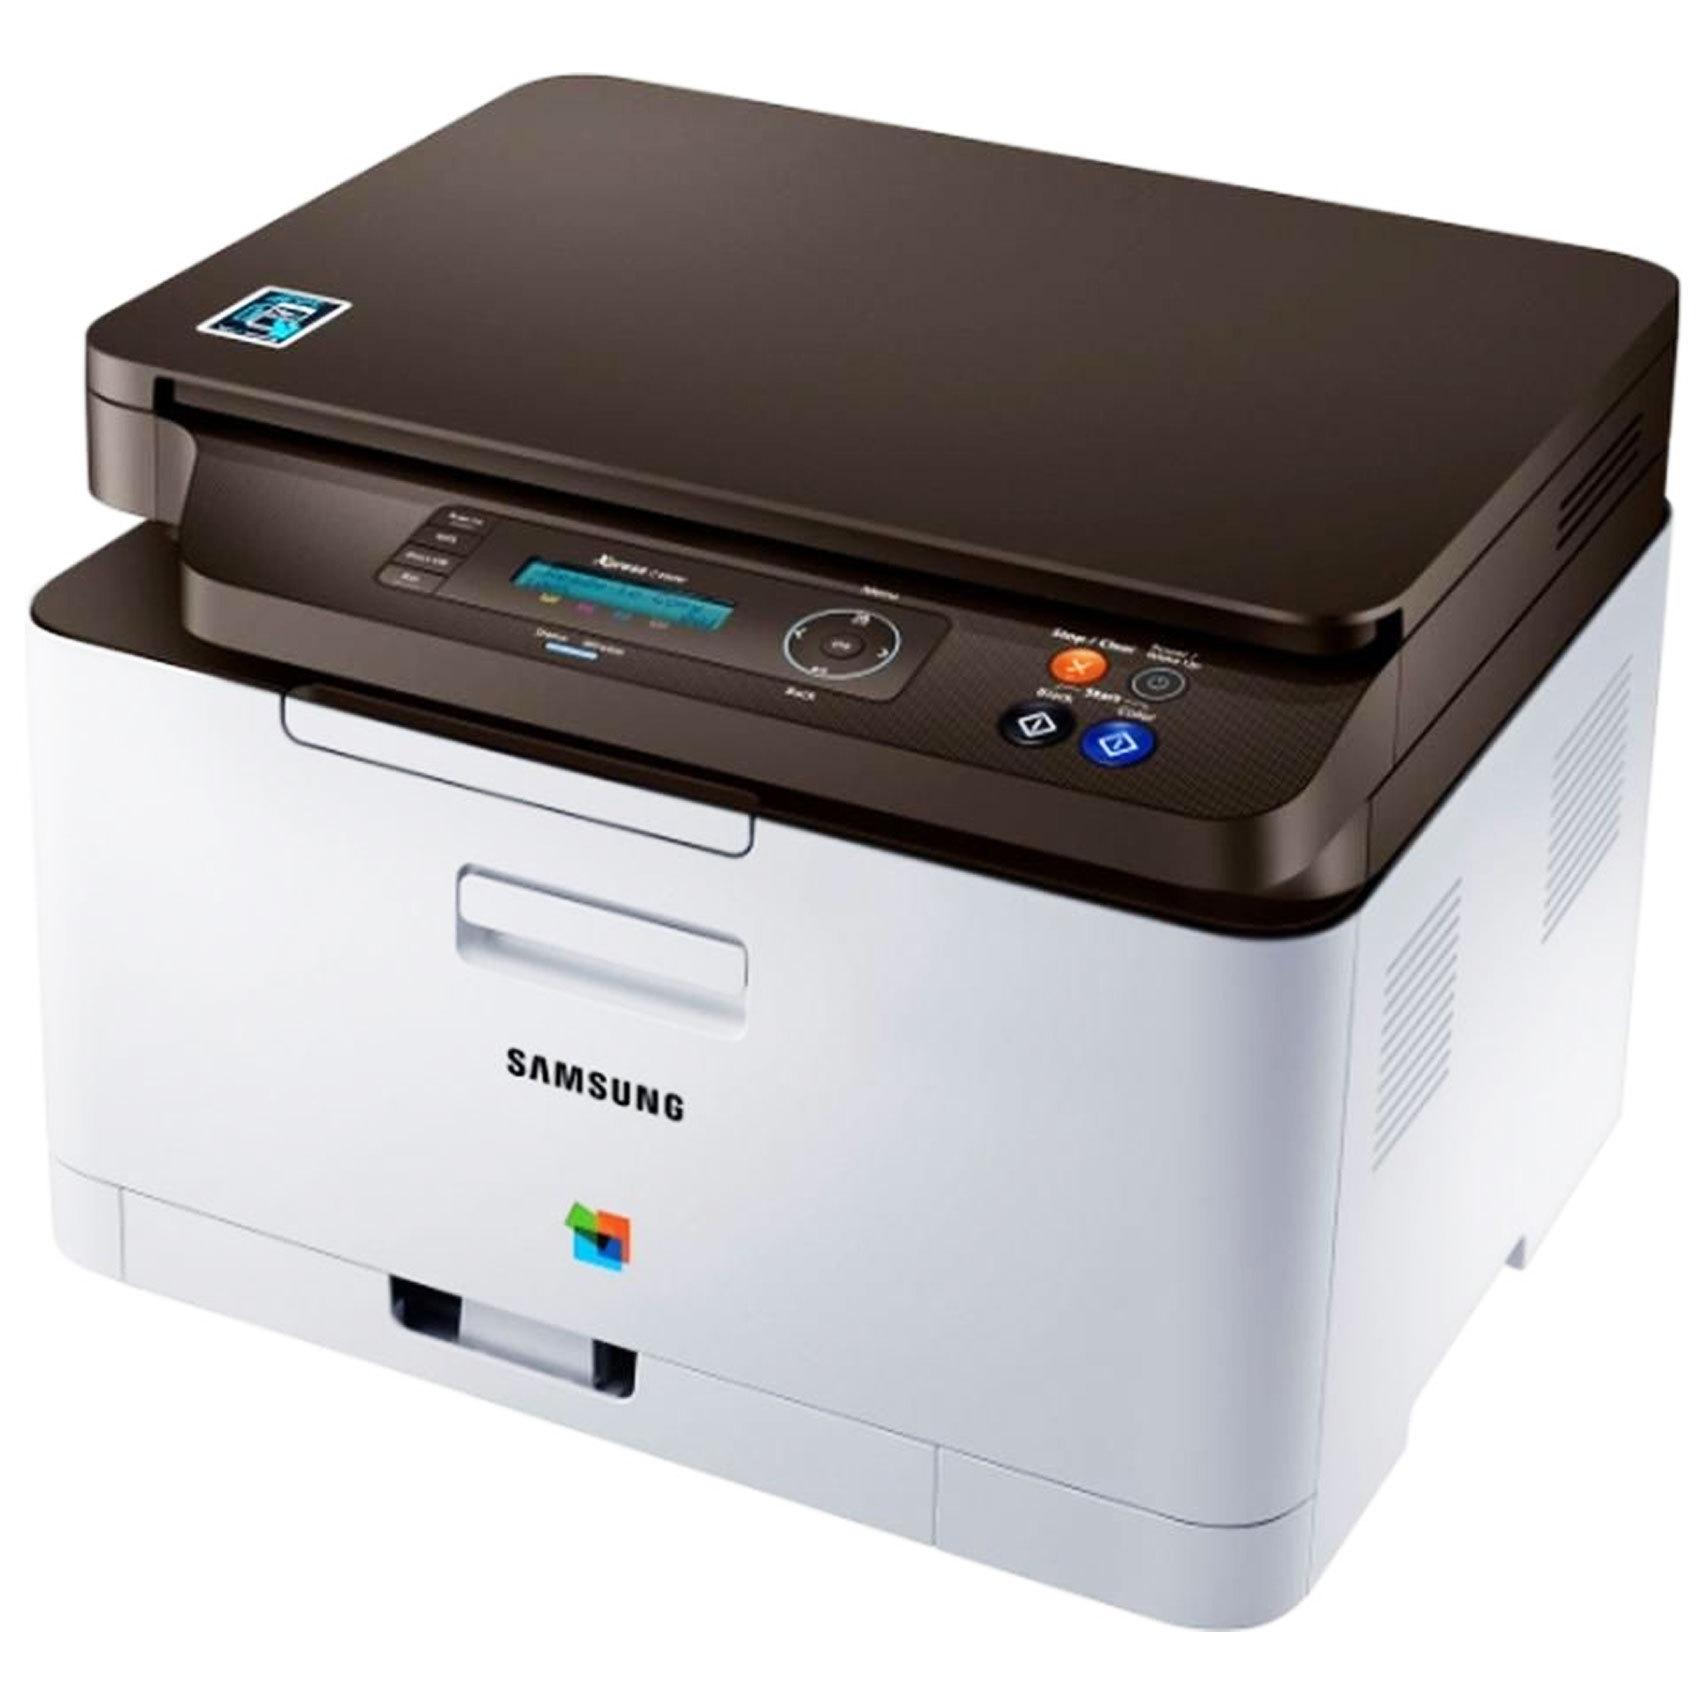 SAMSUNG PRINT LSR WIFI SLC-480W